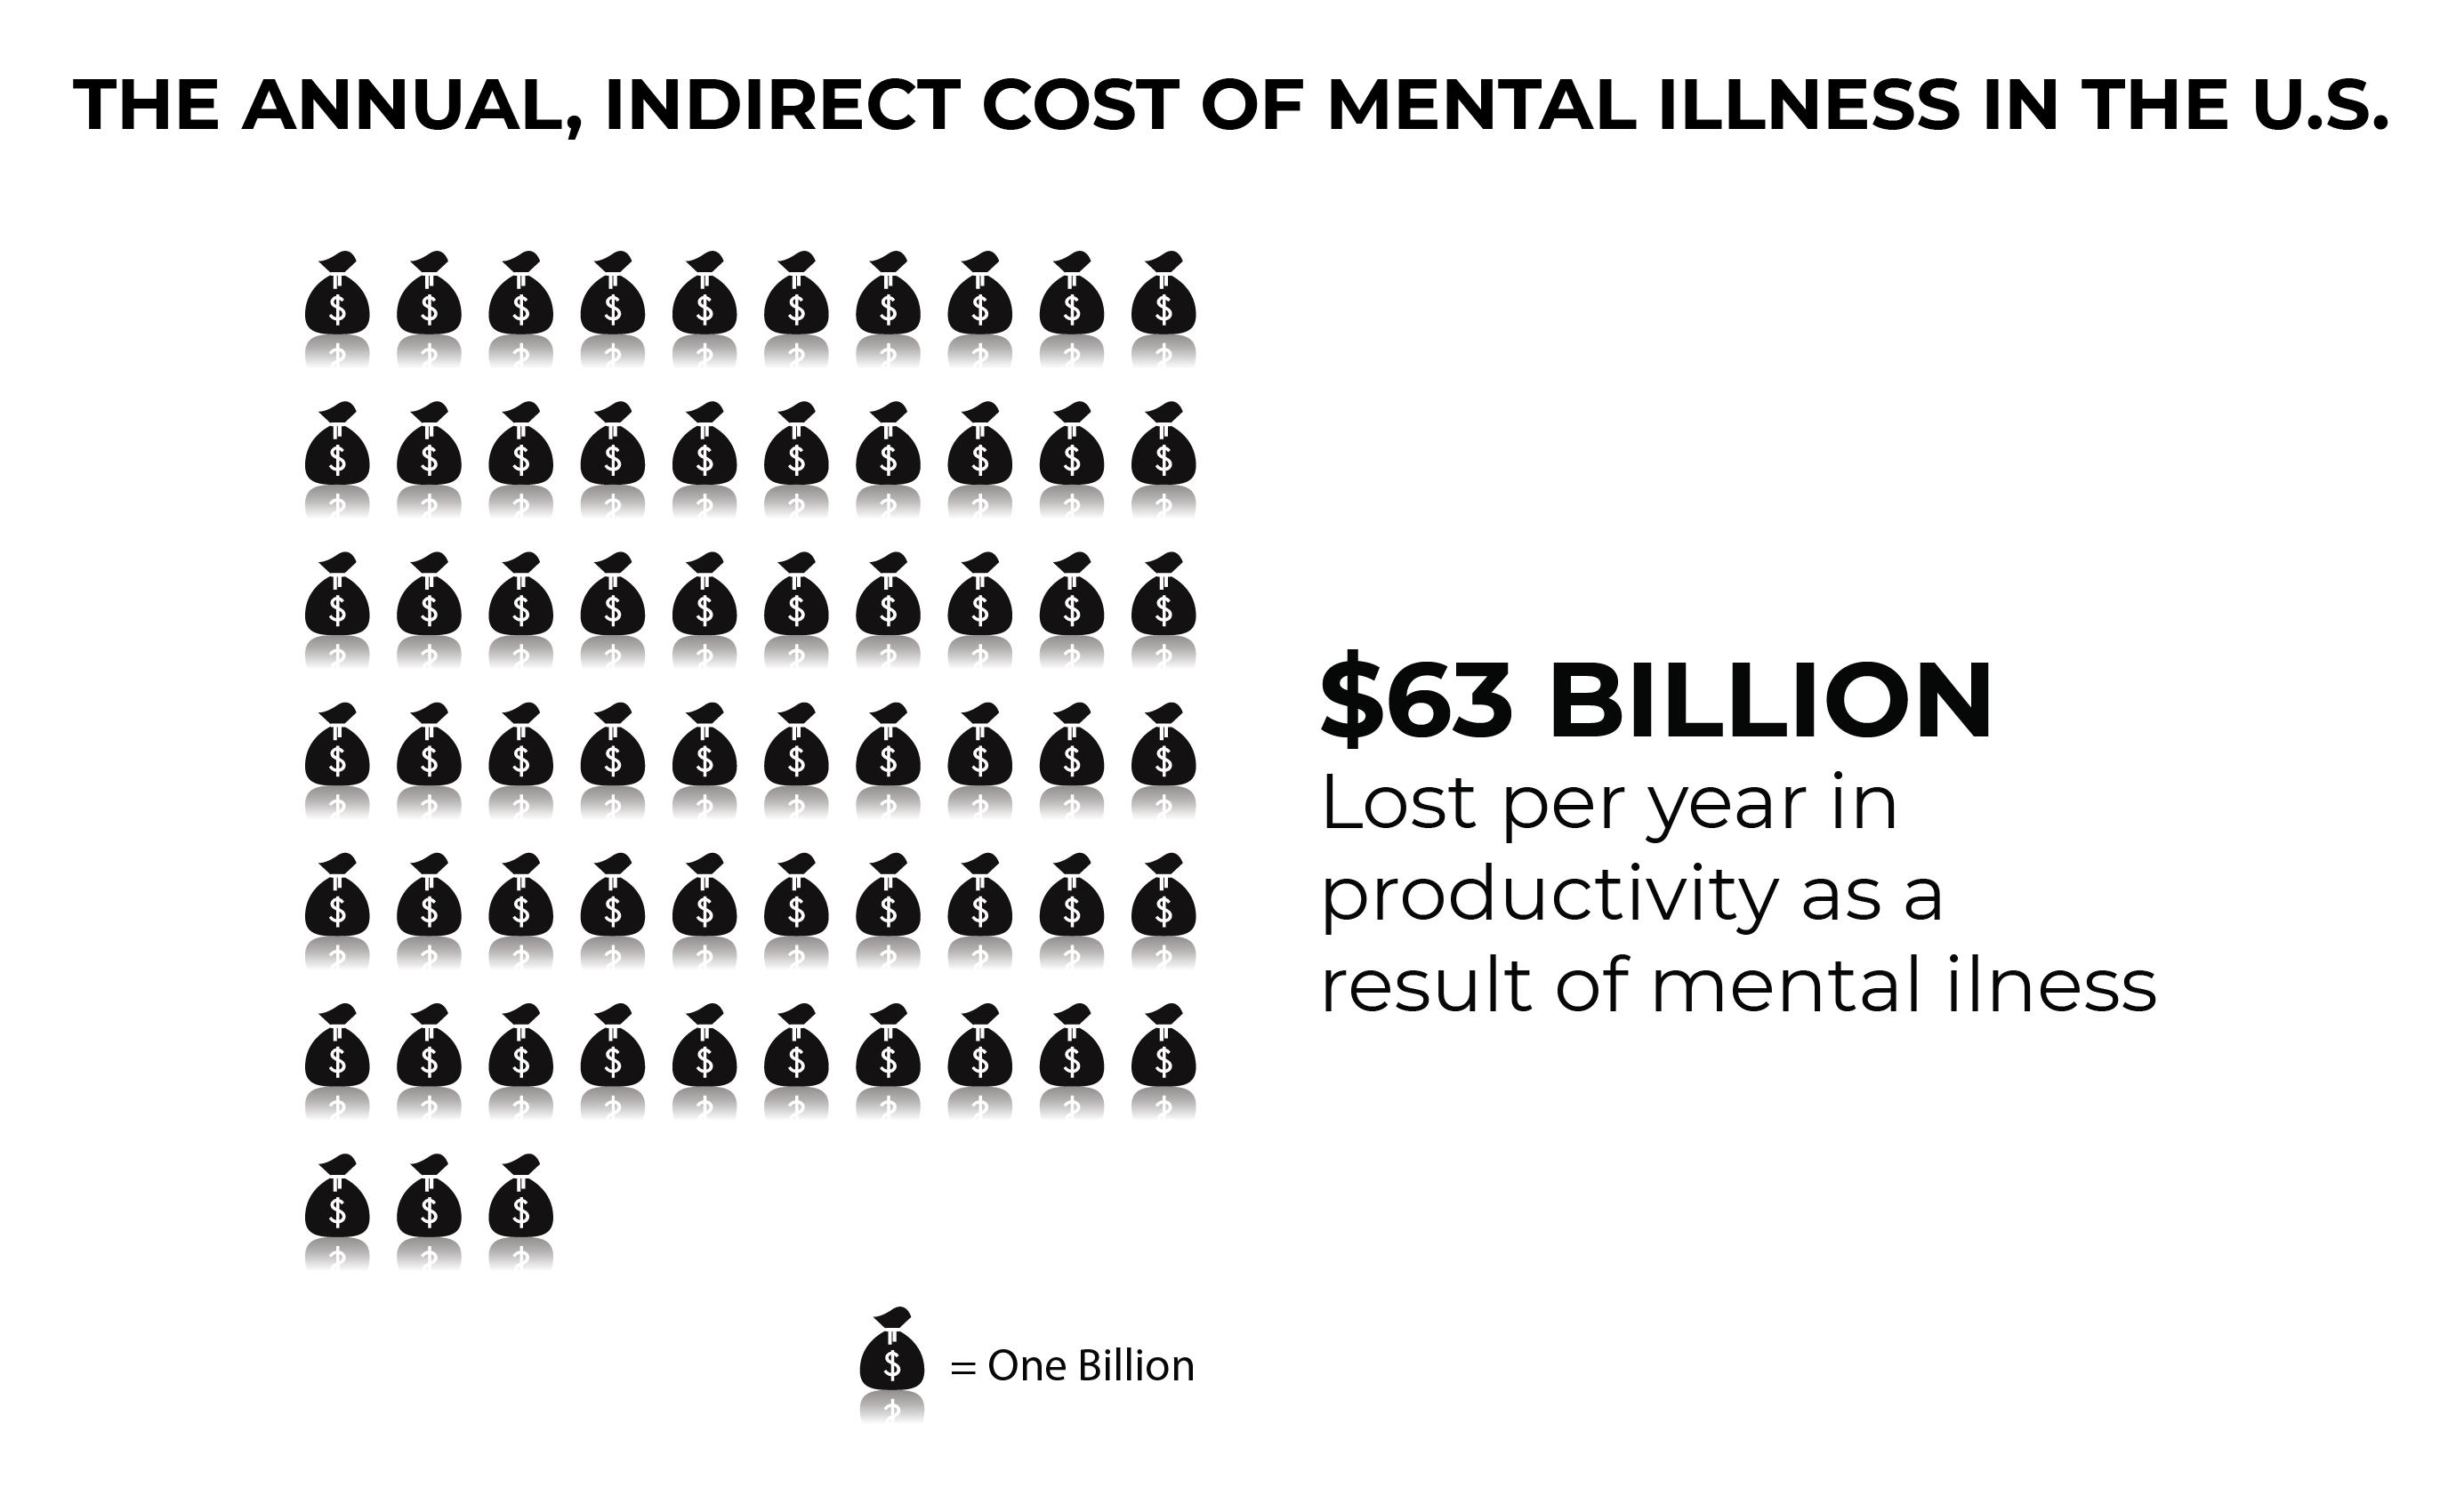 Santa Barbara Mental Health Guide - Annual Indirect Cost